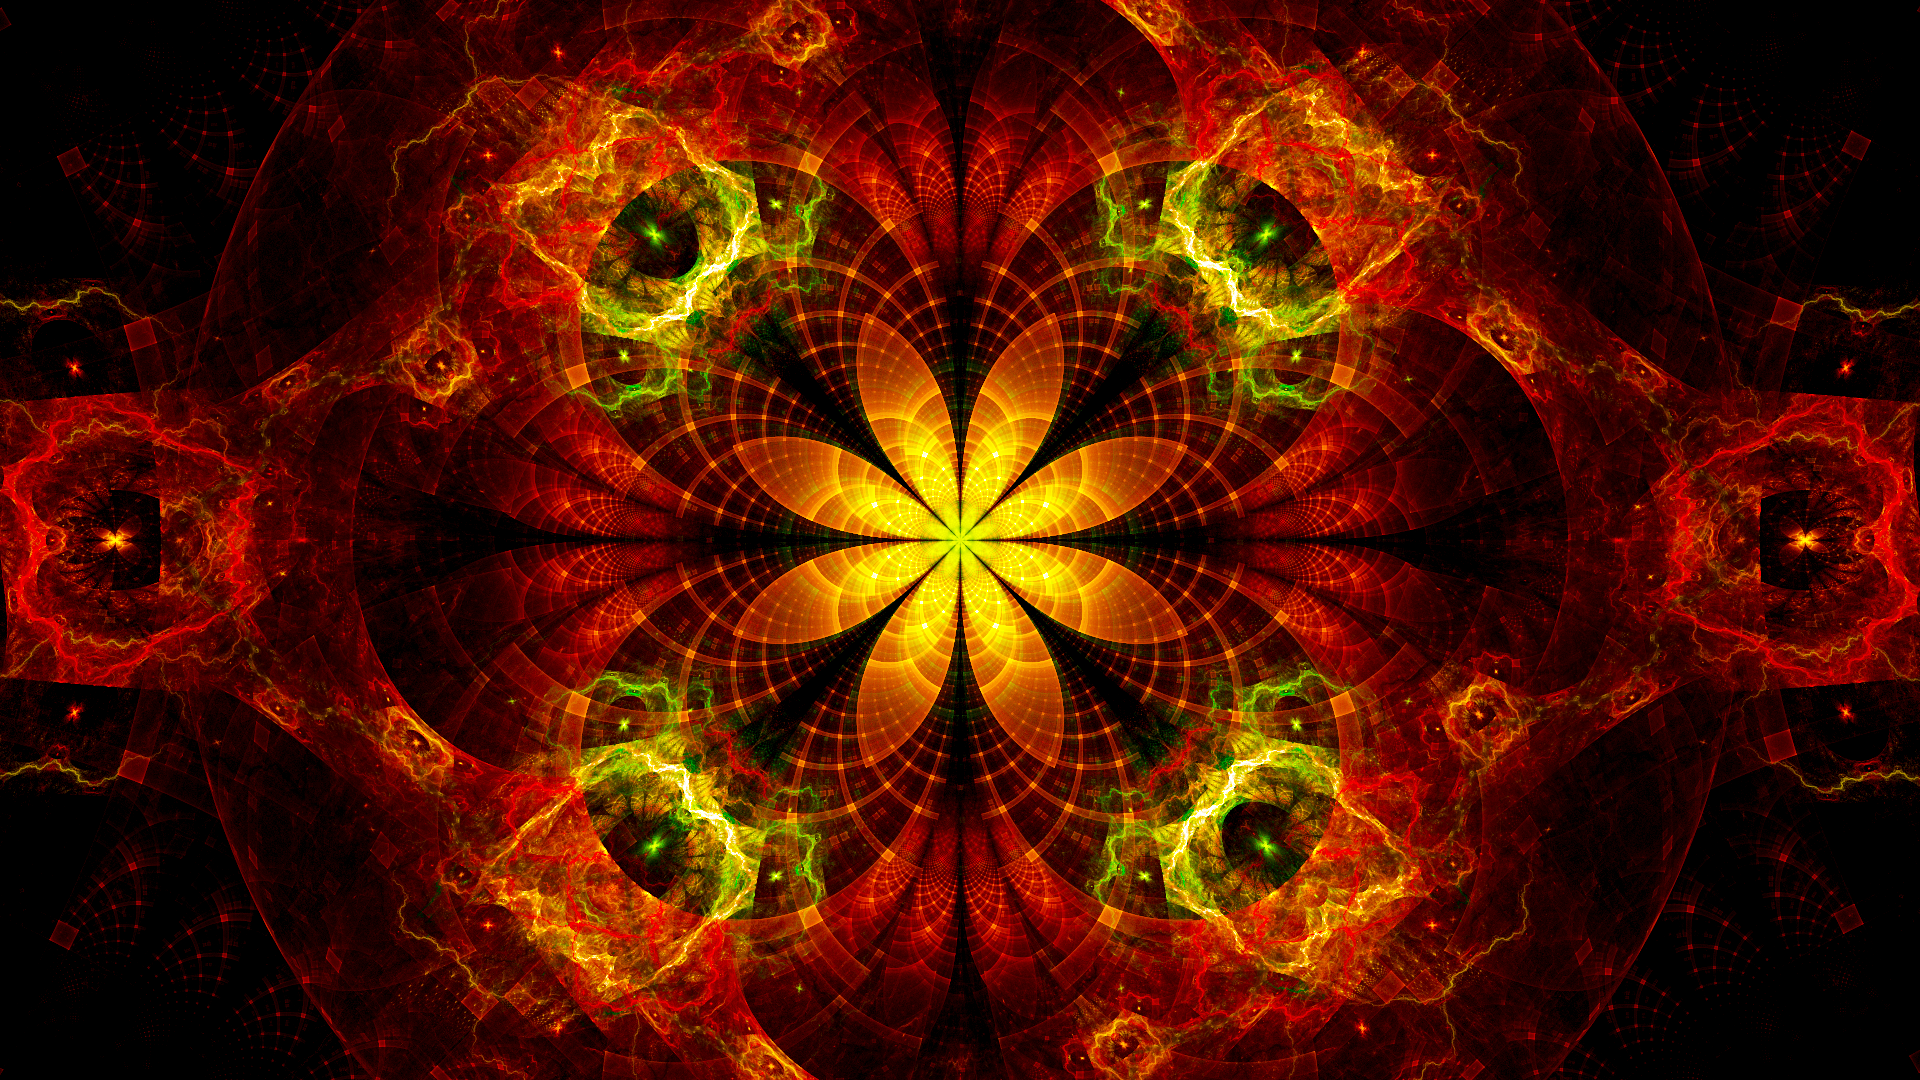 Blooming Onion by Fractamonium